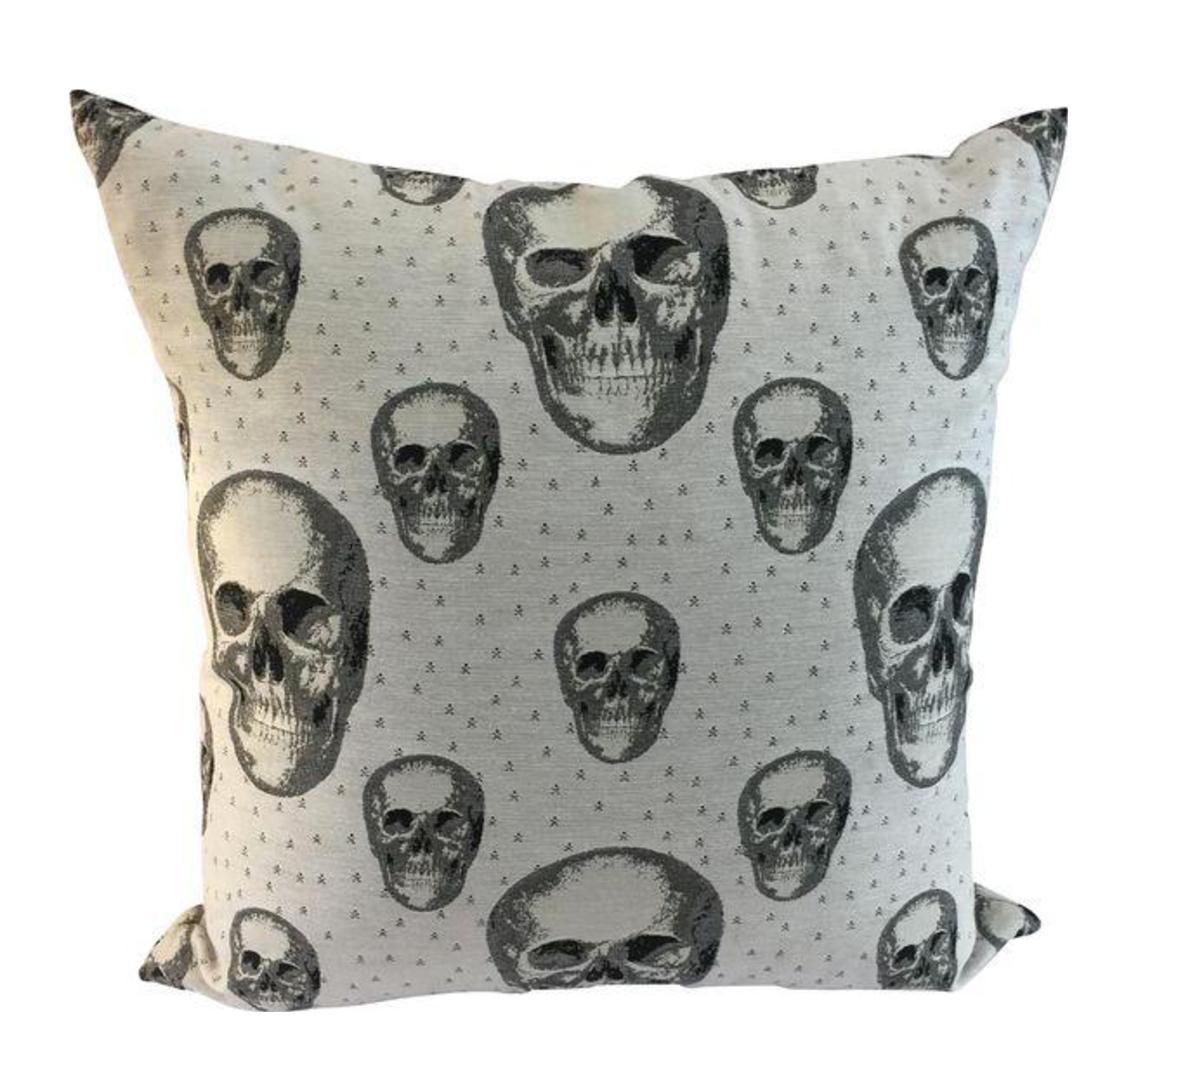 Skull Decorative Pillow Home Decor Pillows